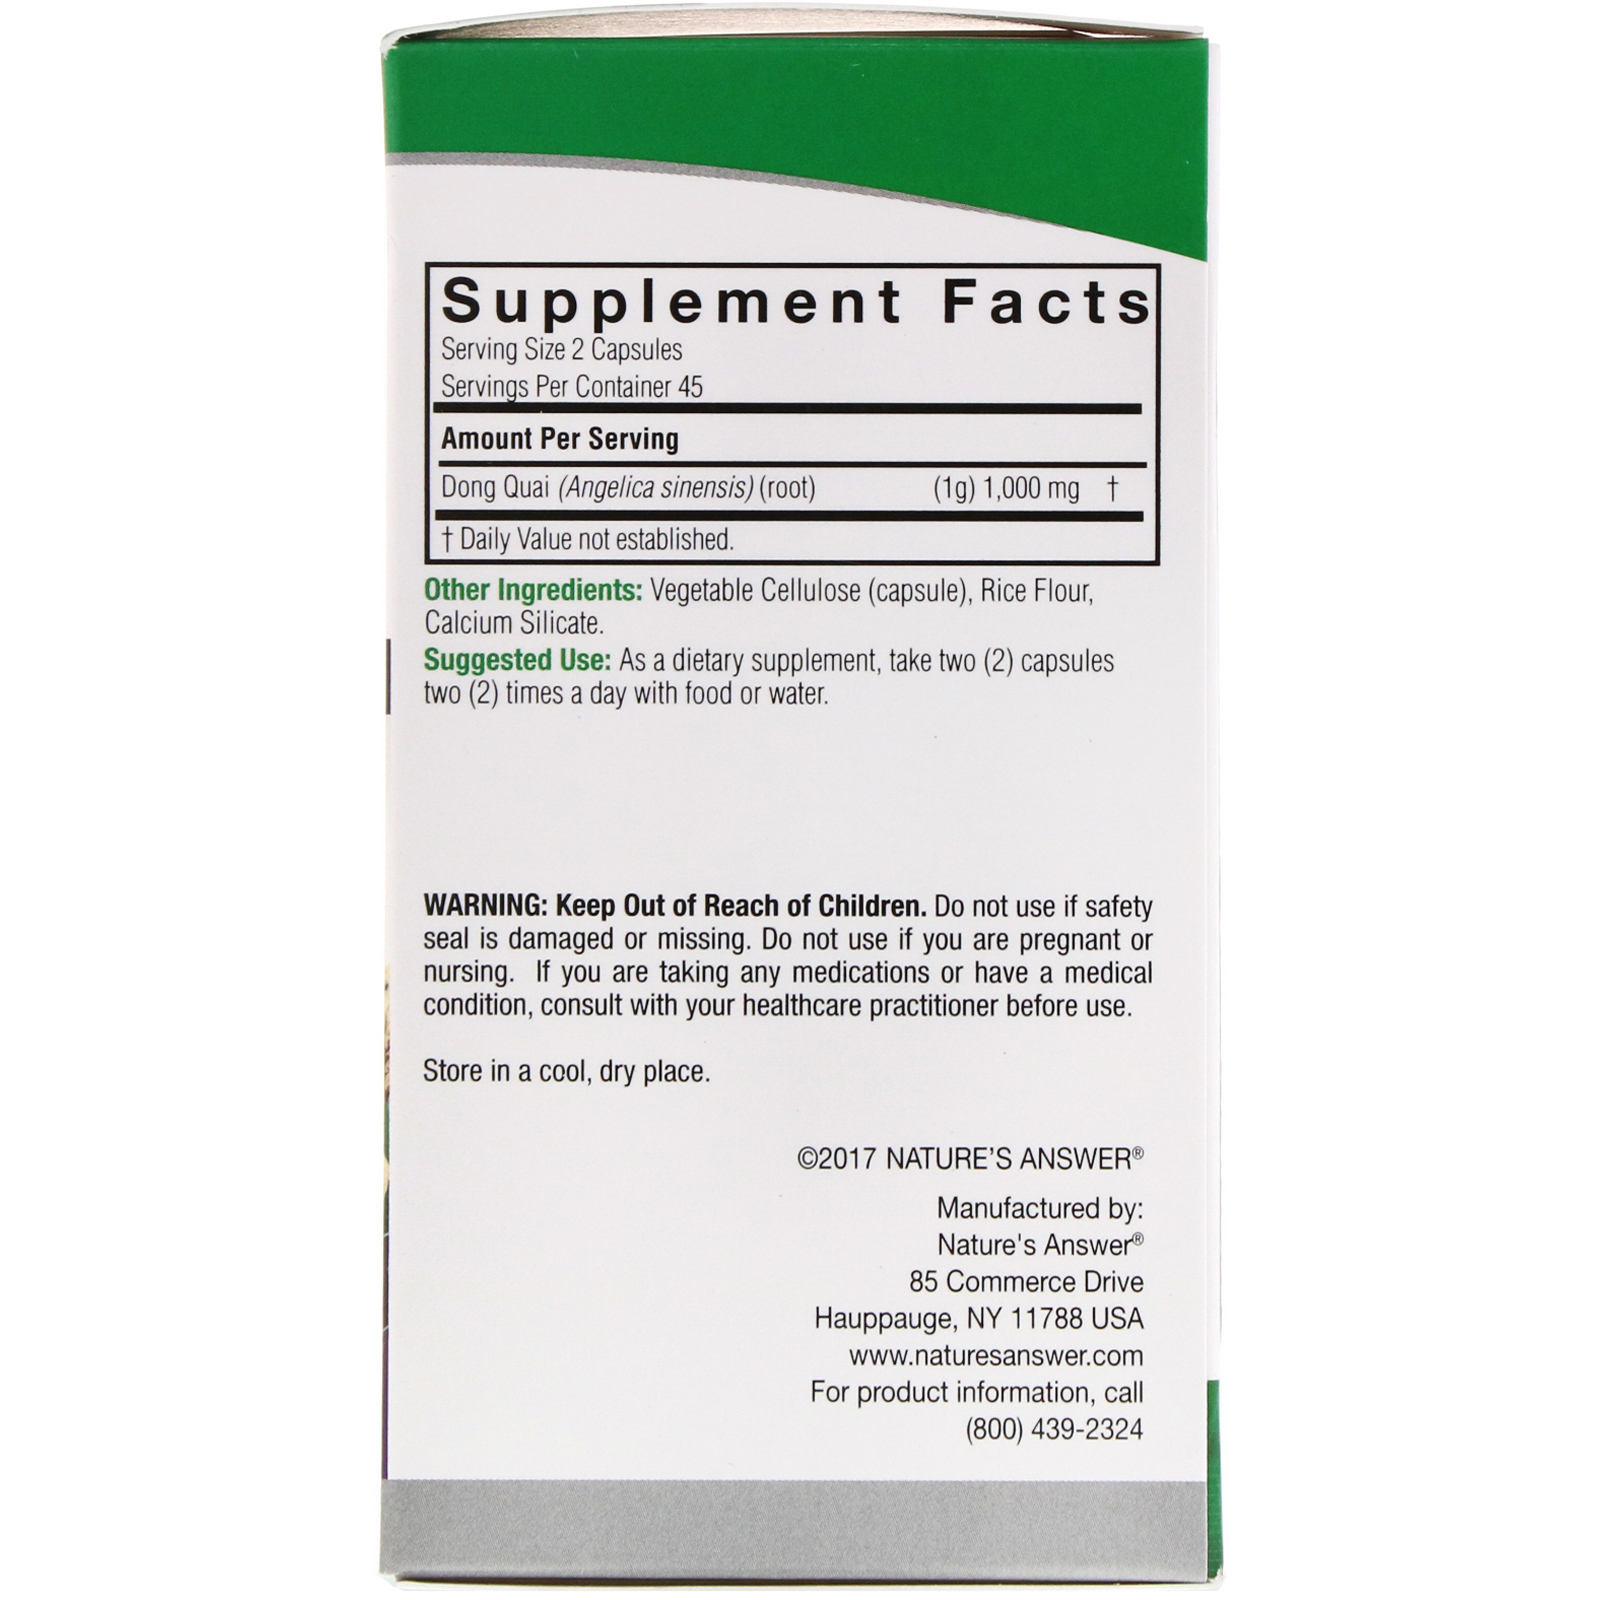 Nature's Answer, Dong Quai, 1,000 mg, 90 Vegetarian Capsules - iHerb com